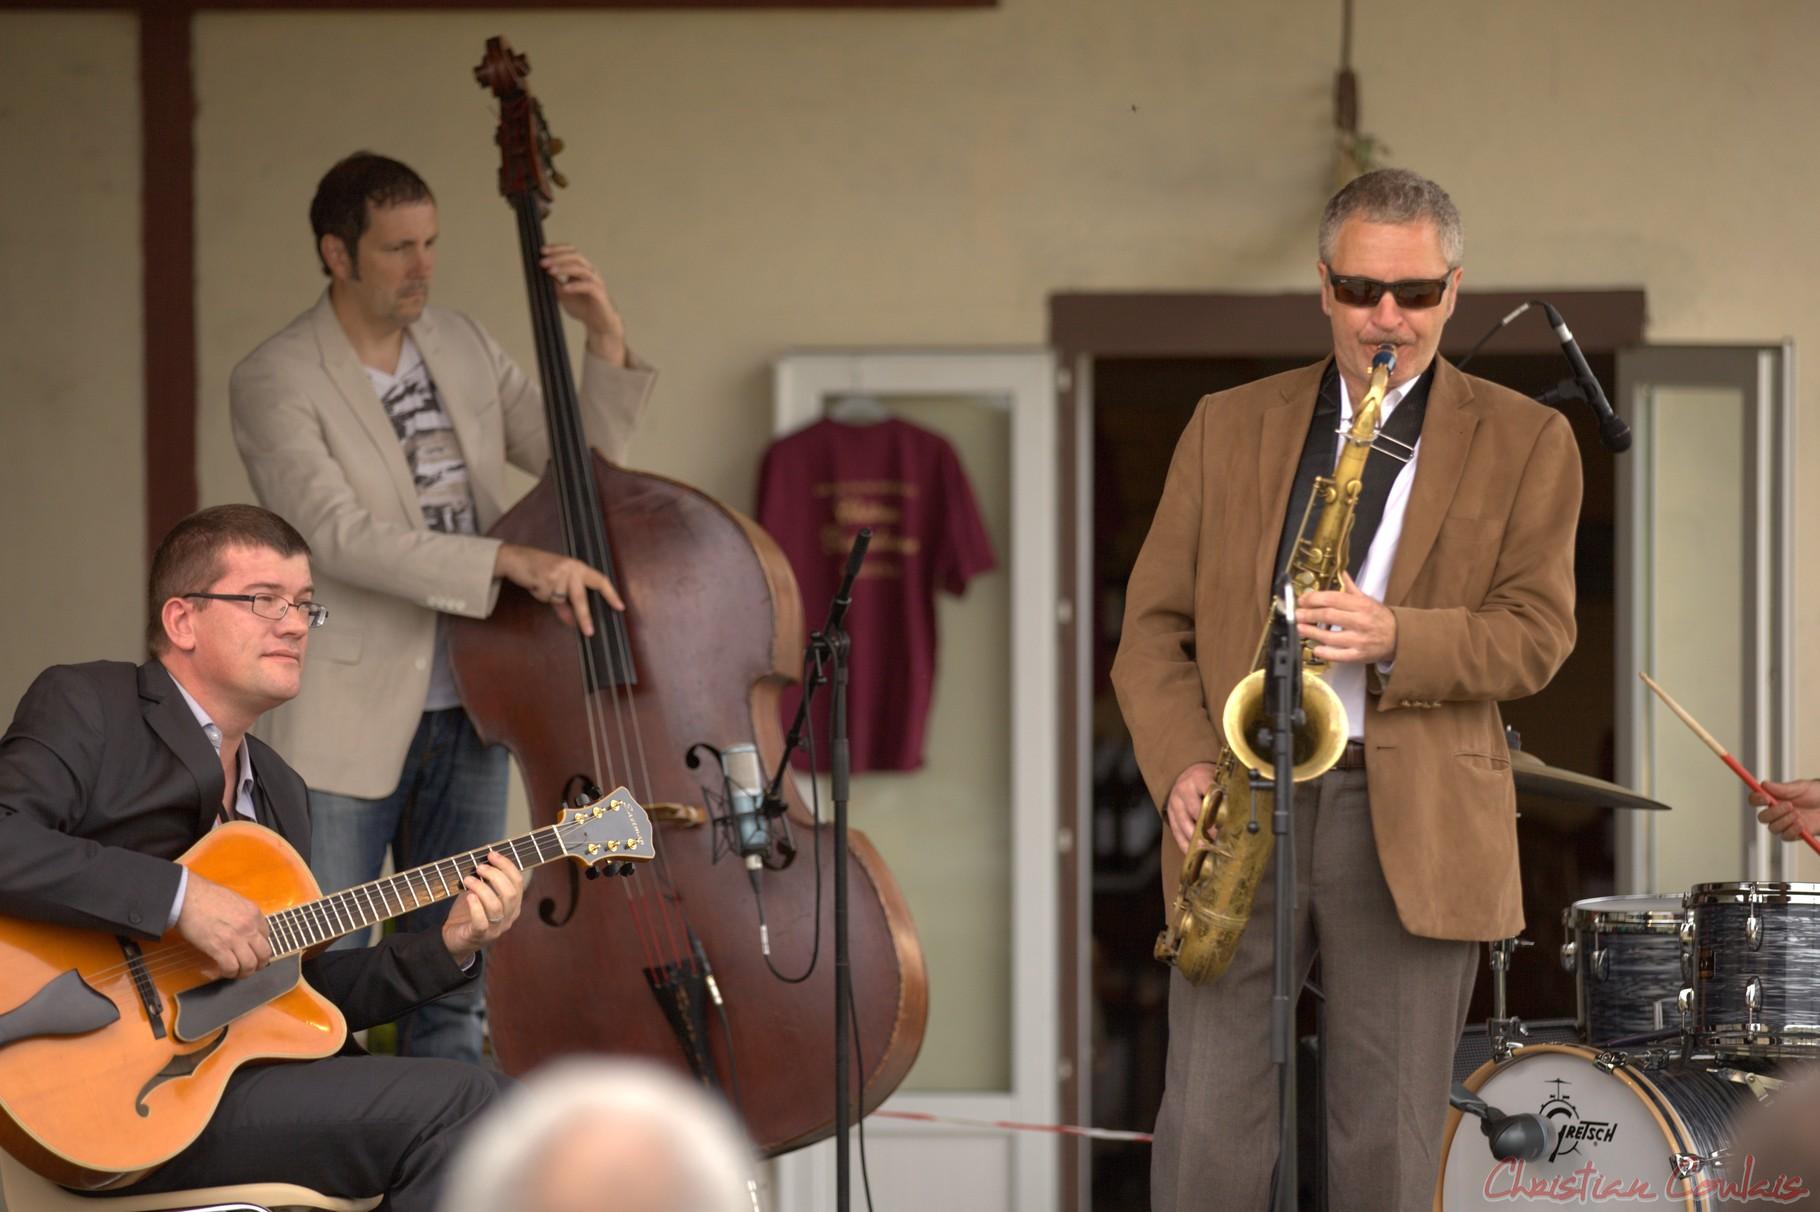 Festival JAZZ360 2012, Alex Golino (saxophone) & David Blenkhorn (guitare) Quartet, Château Roquebrune à Cénac